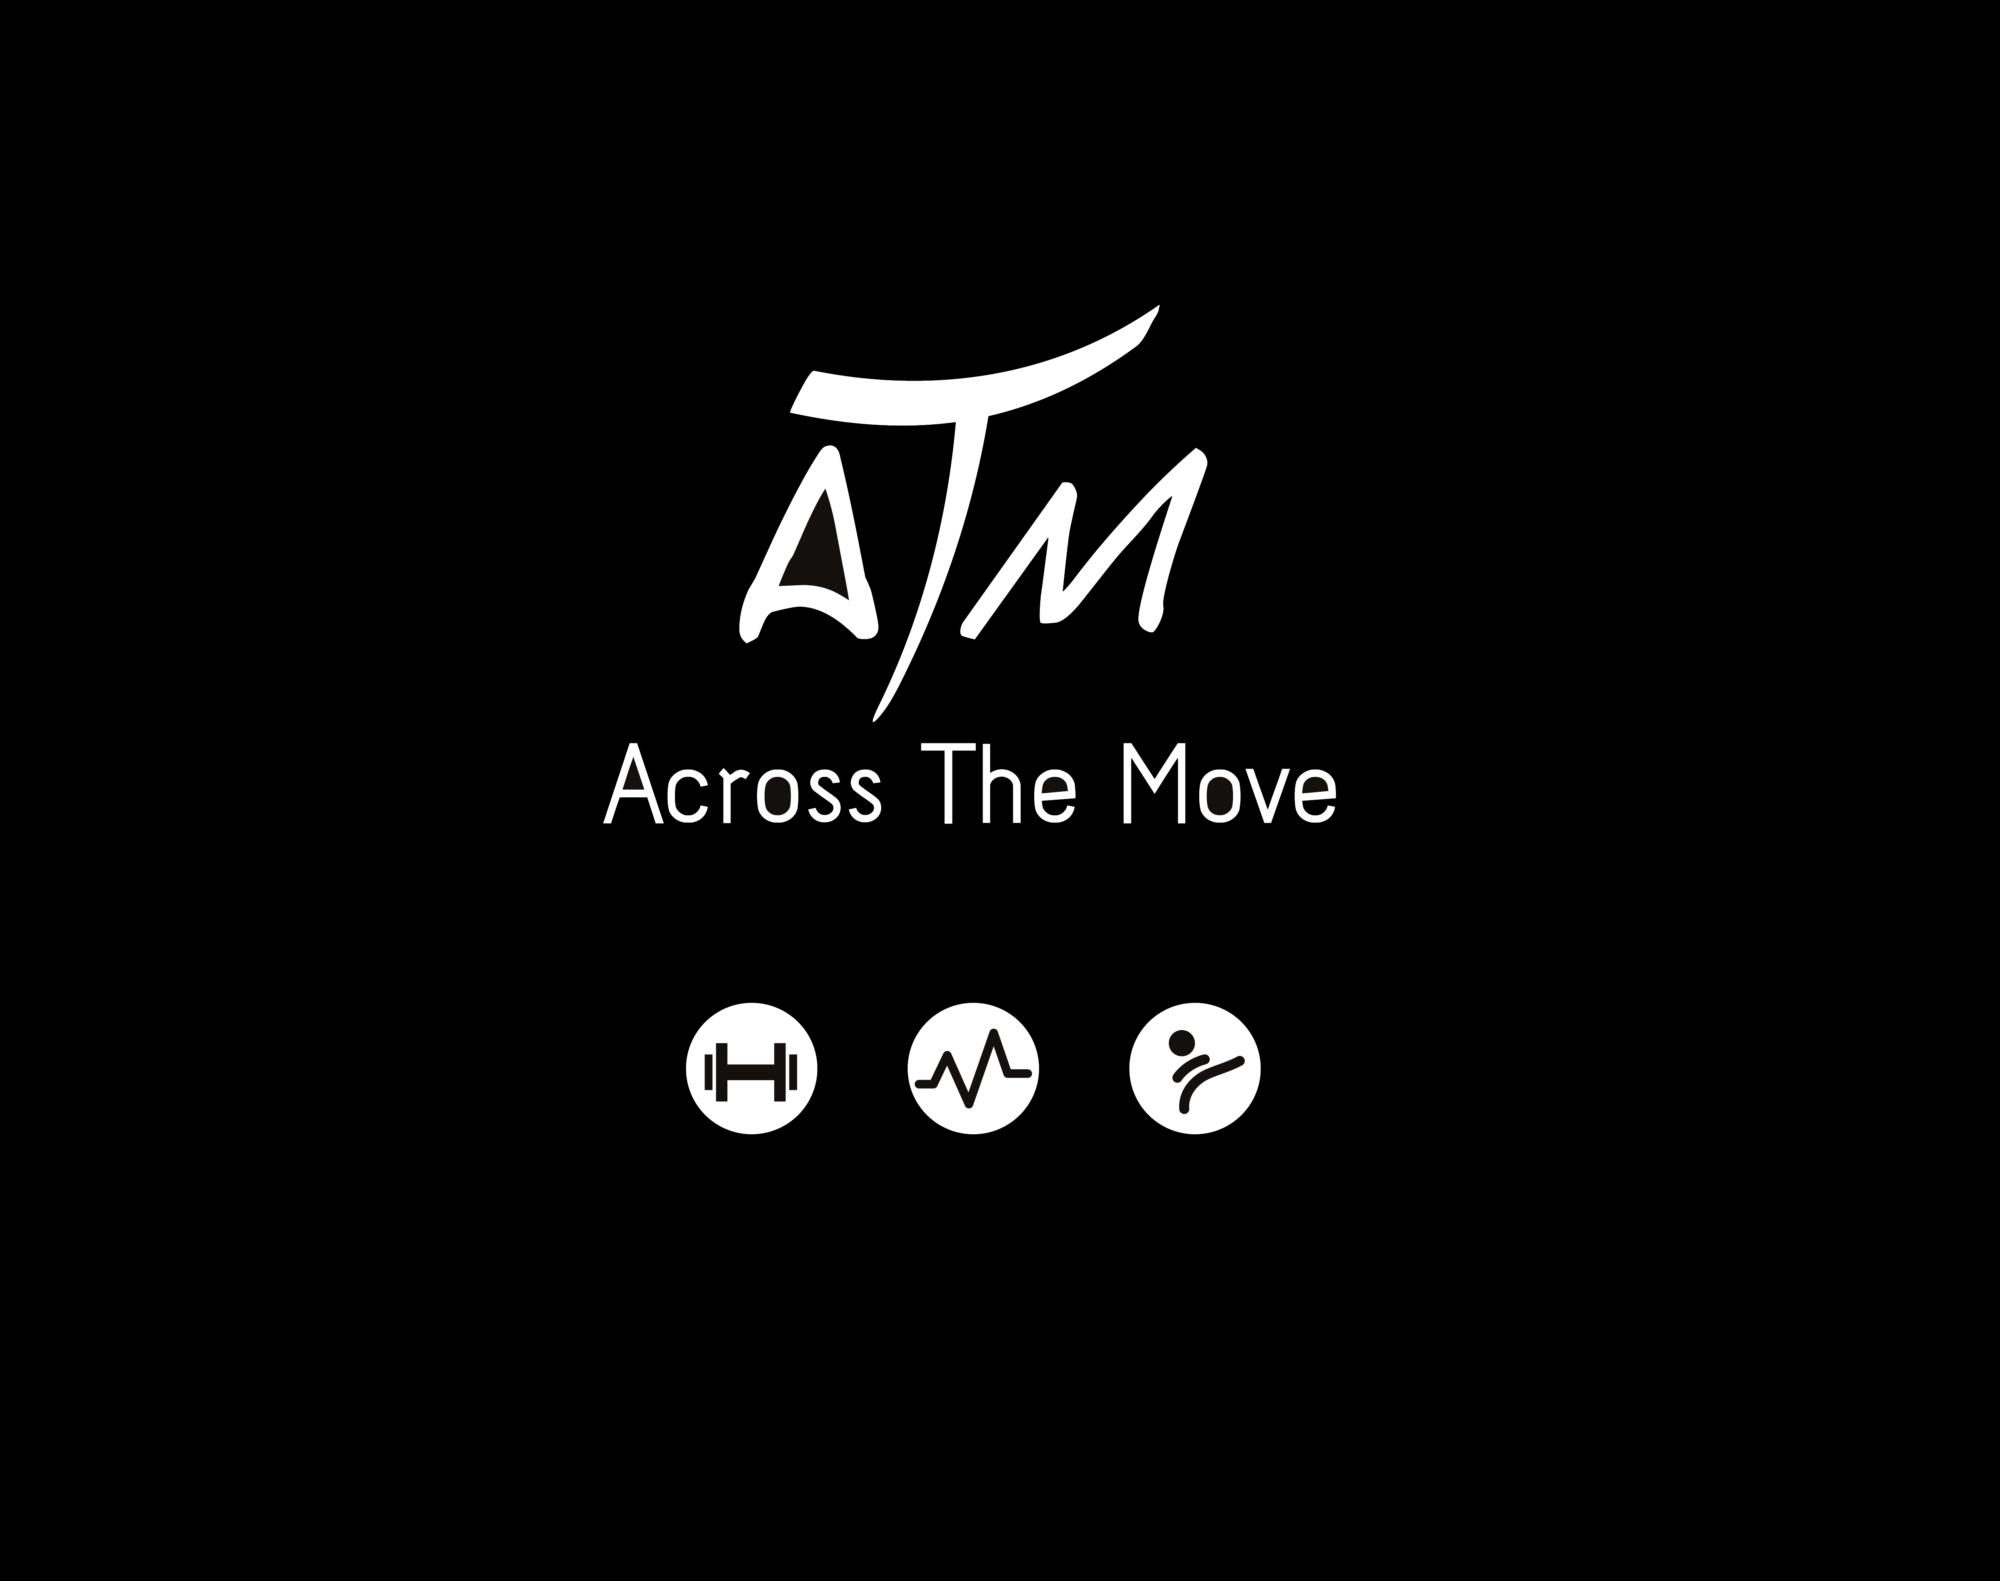 Across the move